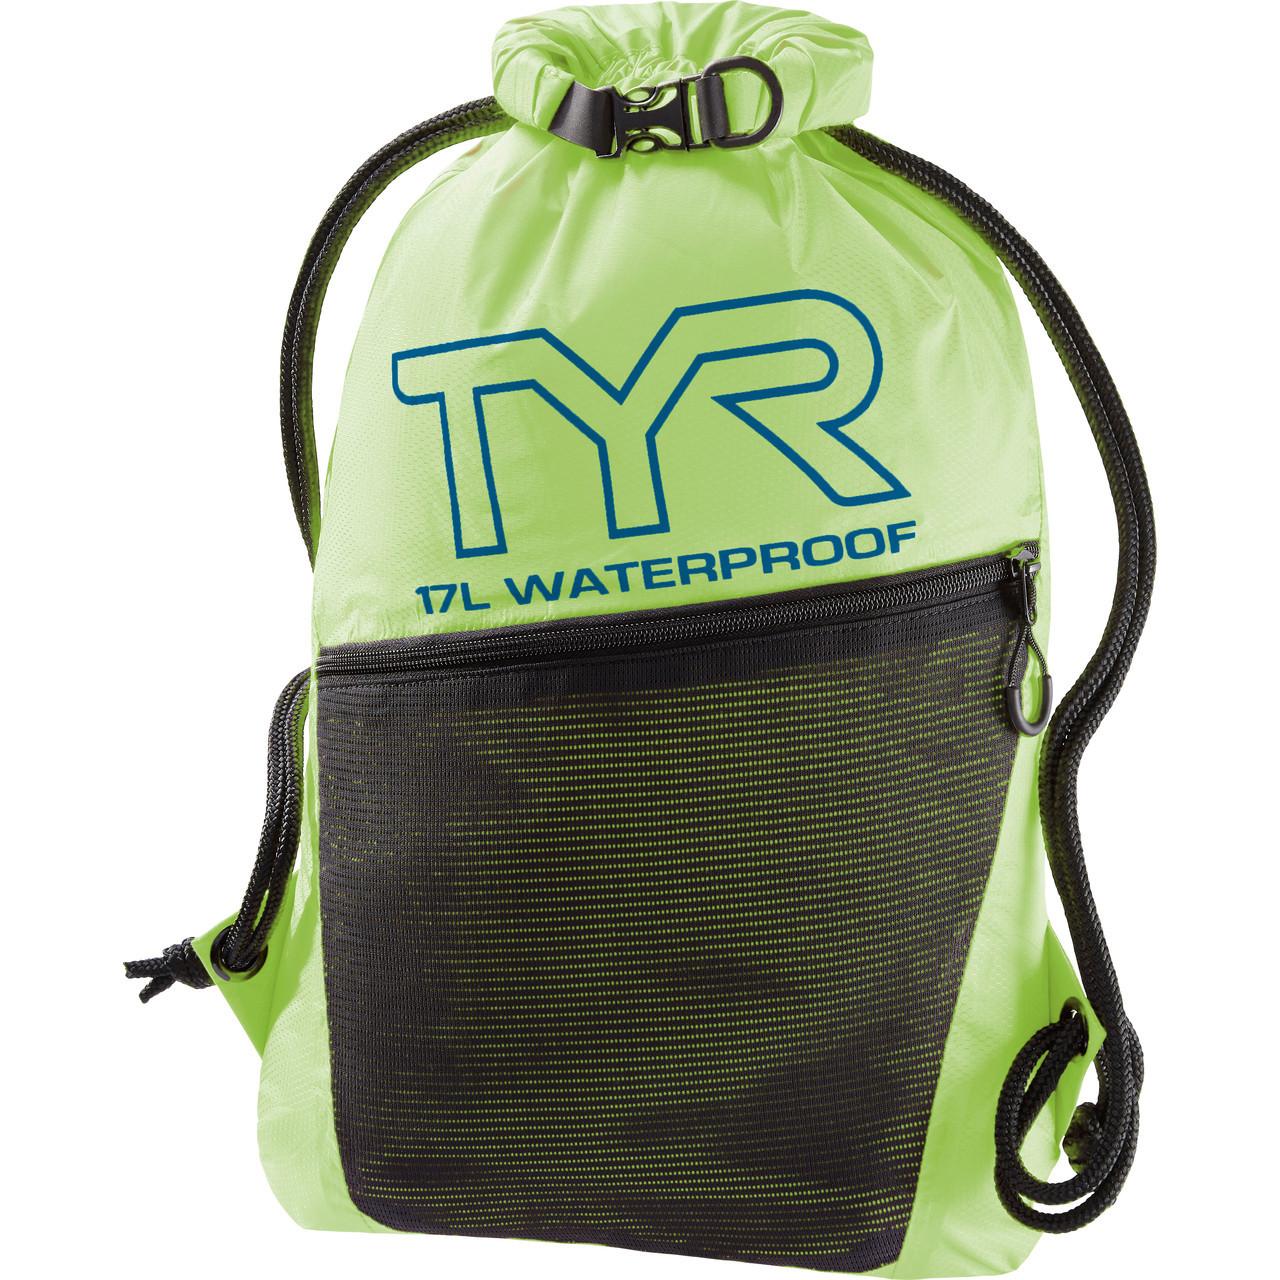 TYR Alliance Waterproof Sack Pack - 2019 price